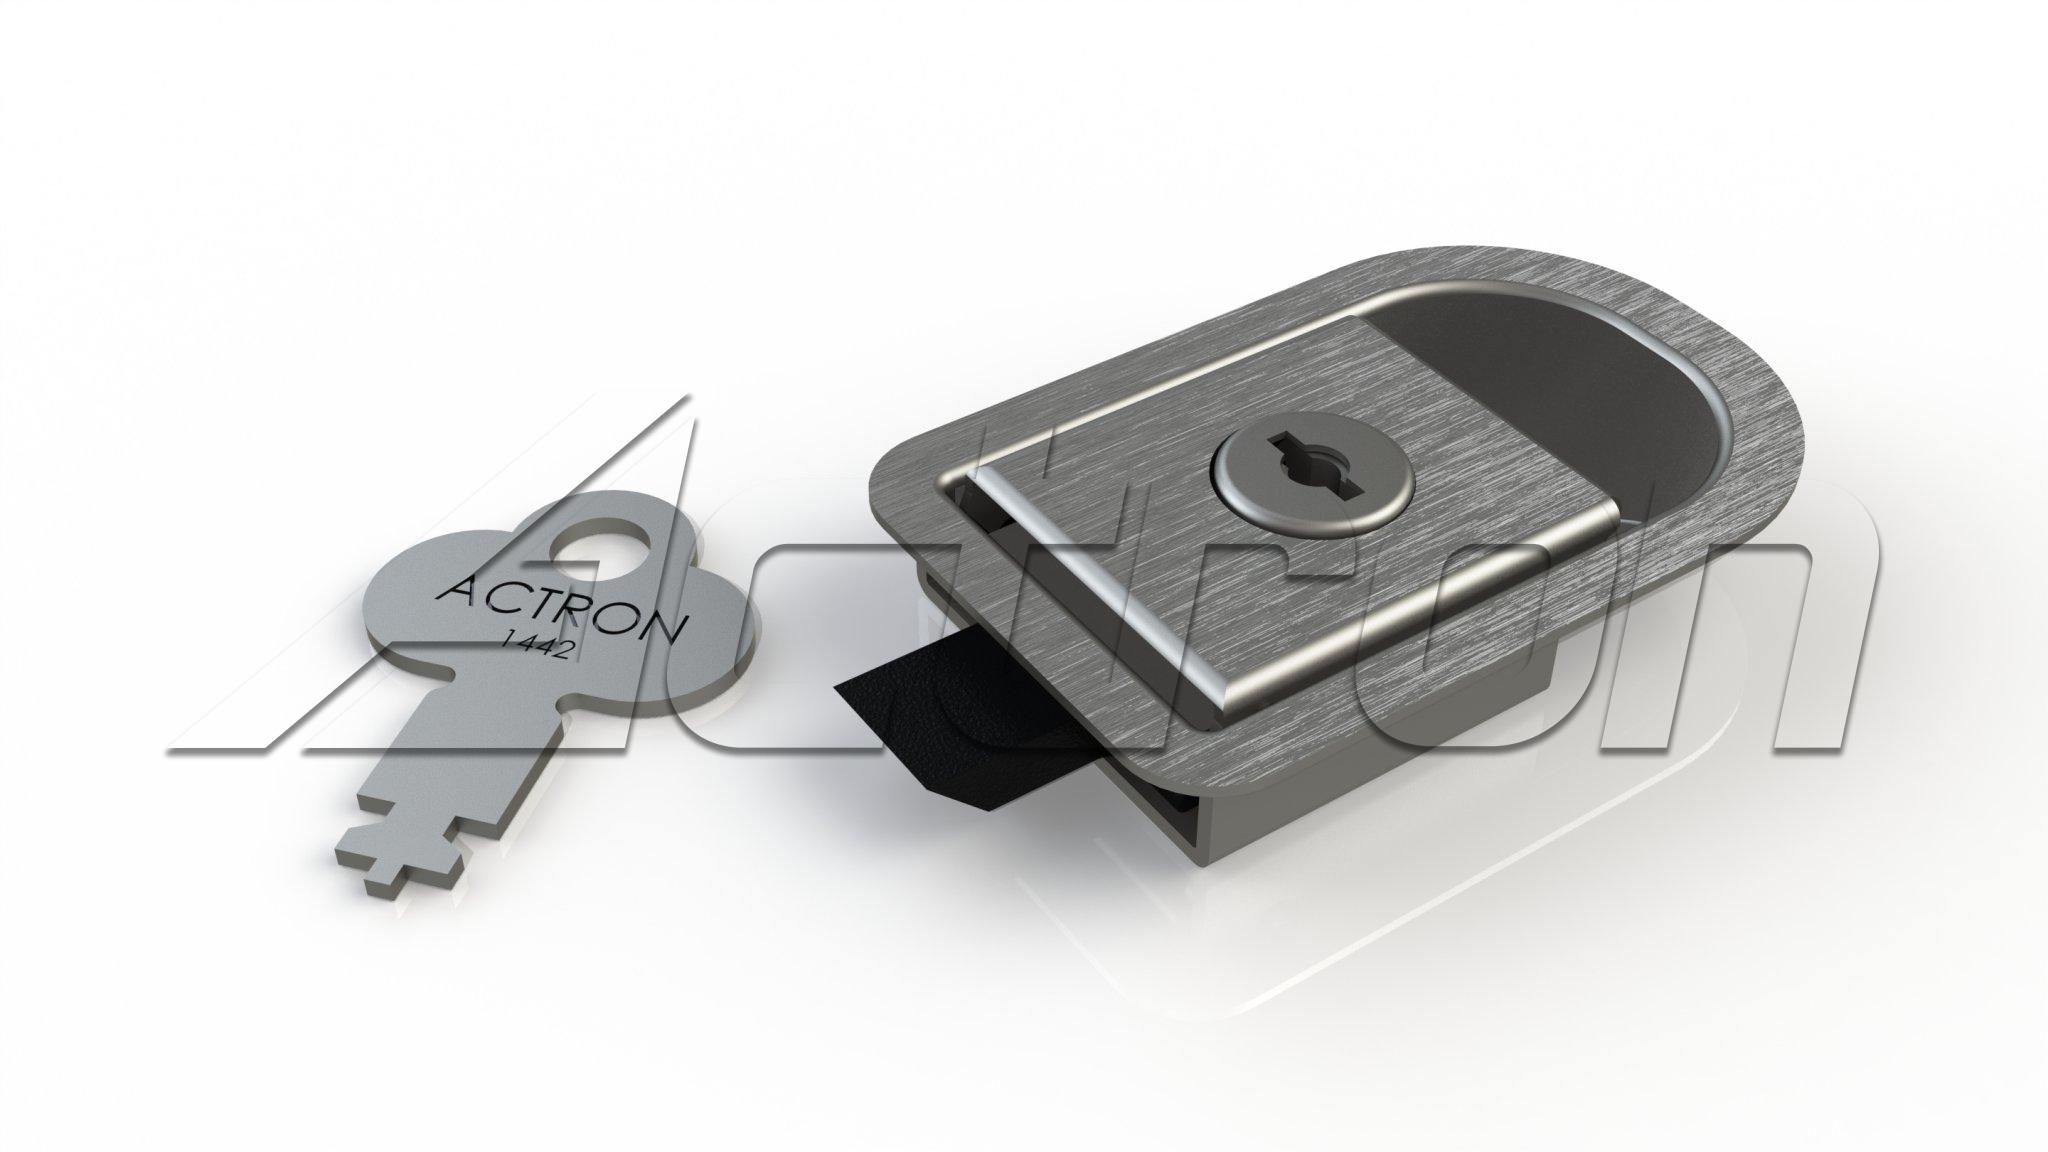 latchlock-assy-8211-paddle-4125-a23542.jpg